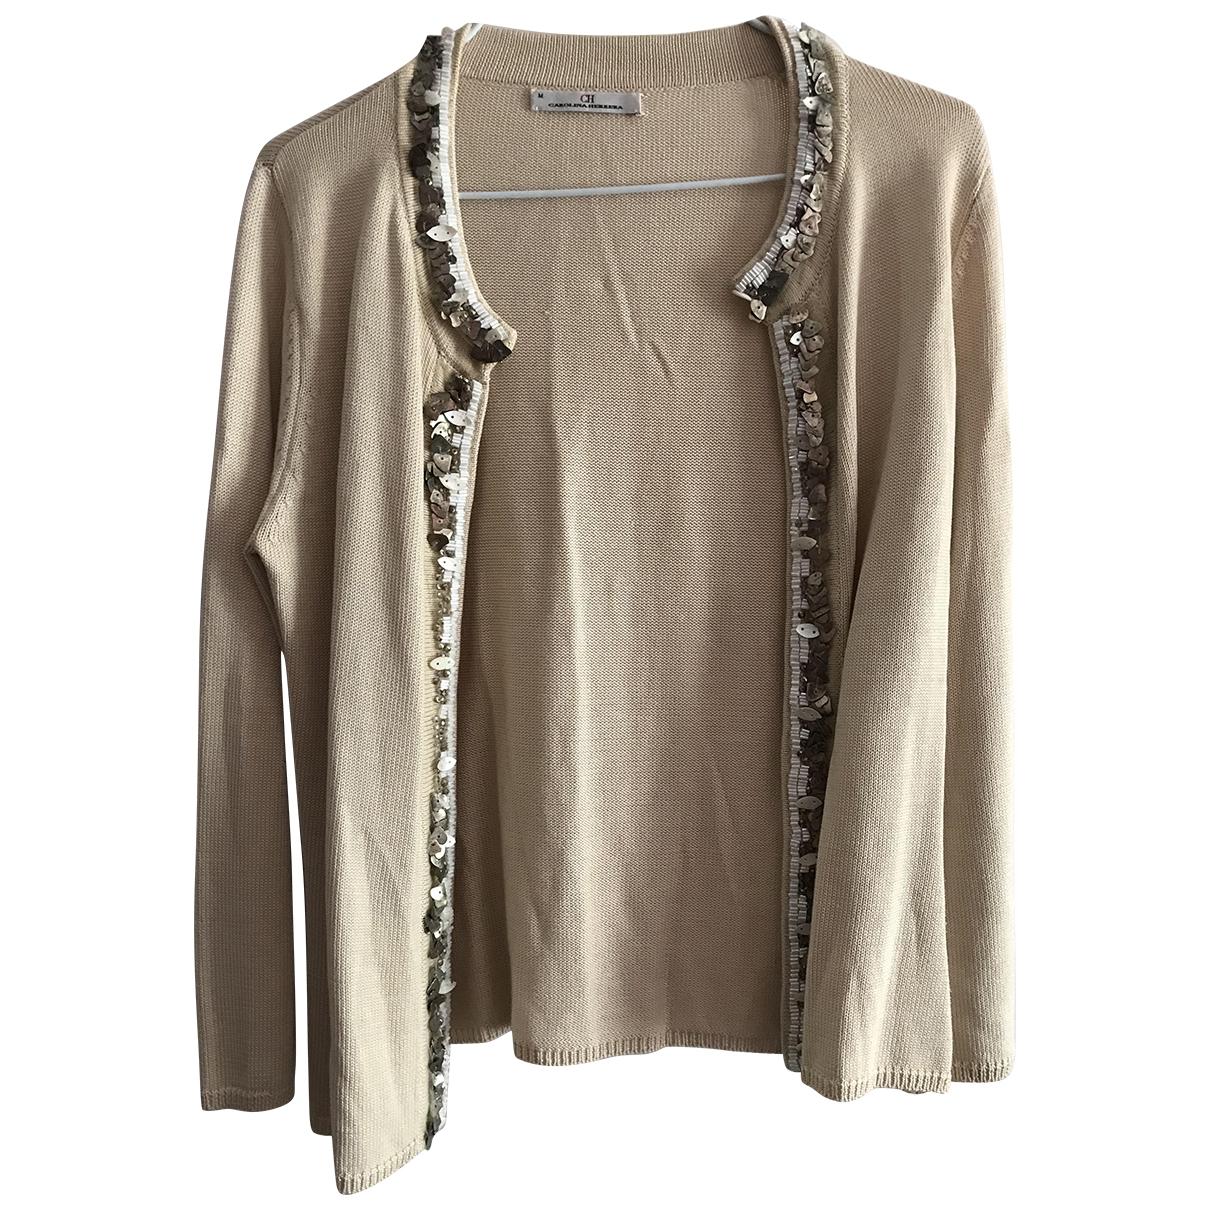 Carolina Herrera \N Pullover in  Beige Wolle